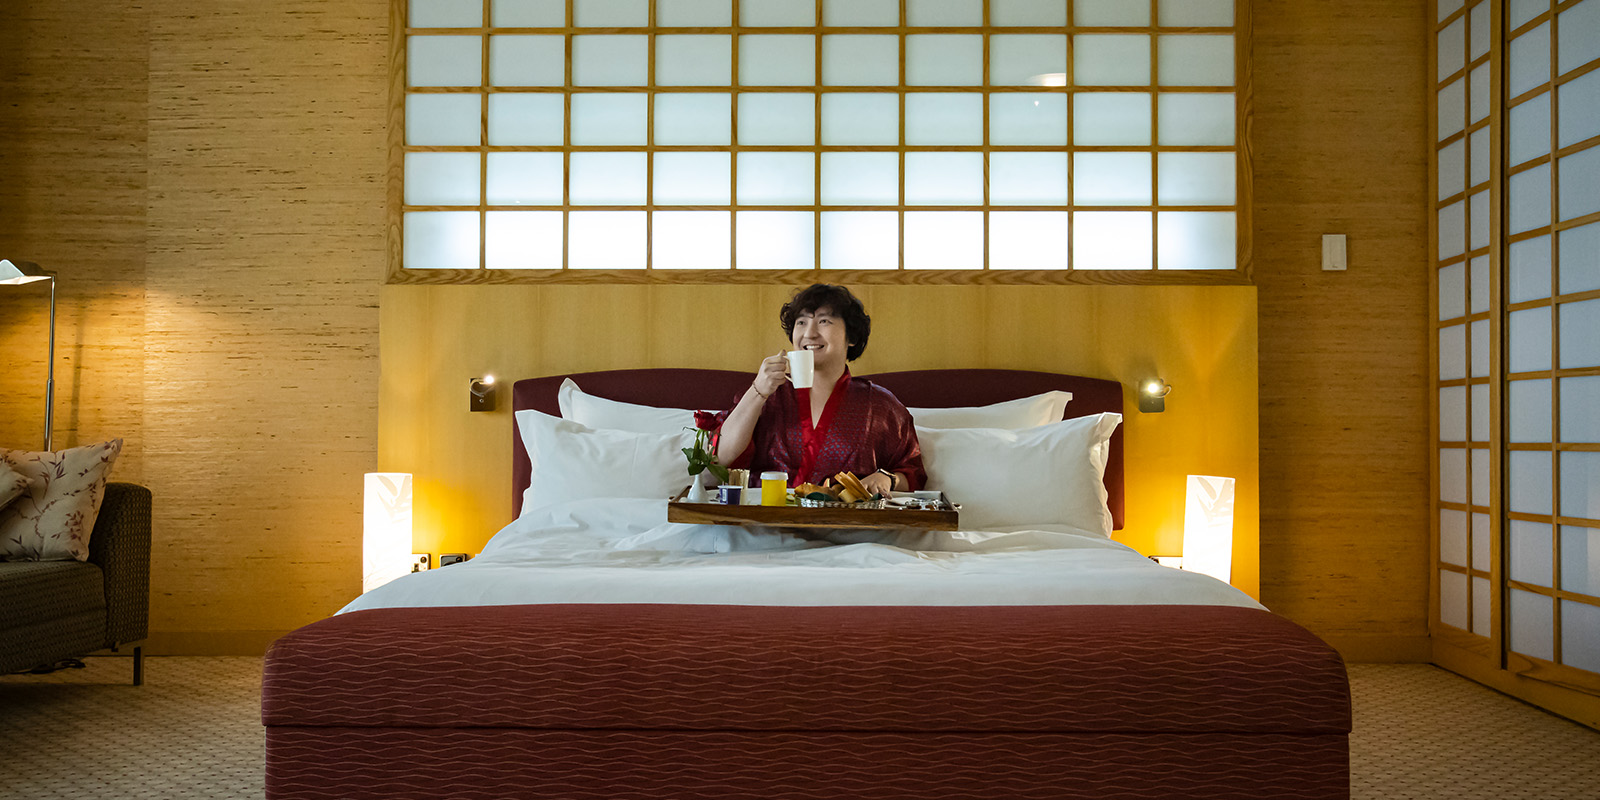 Decorative Suites for Elite Travellers